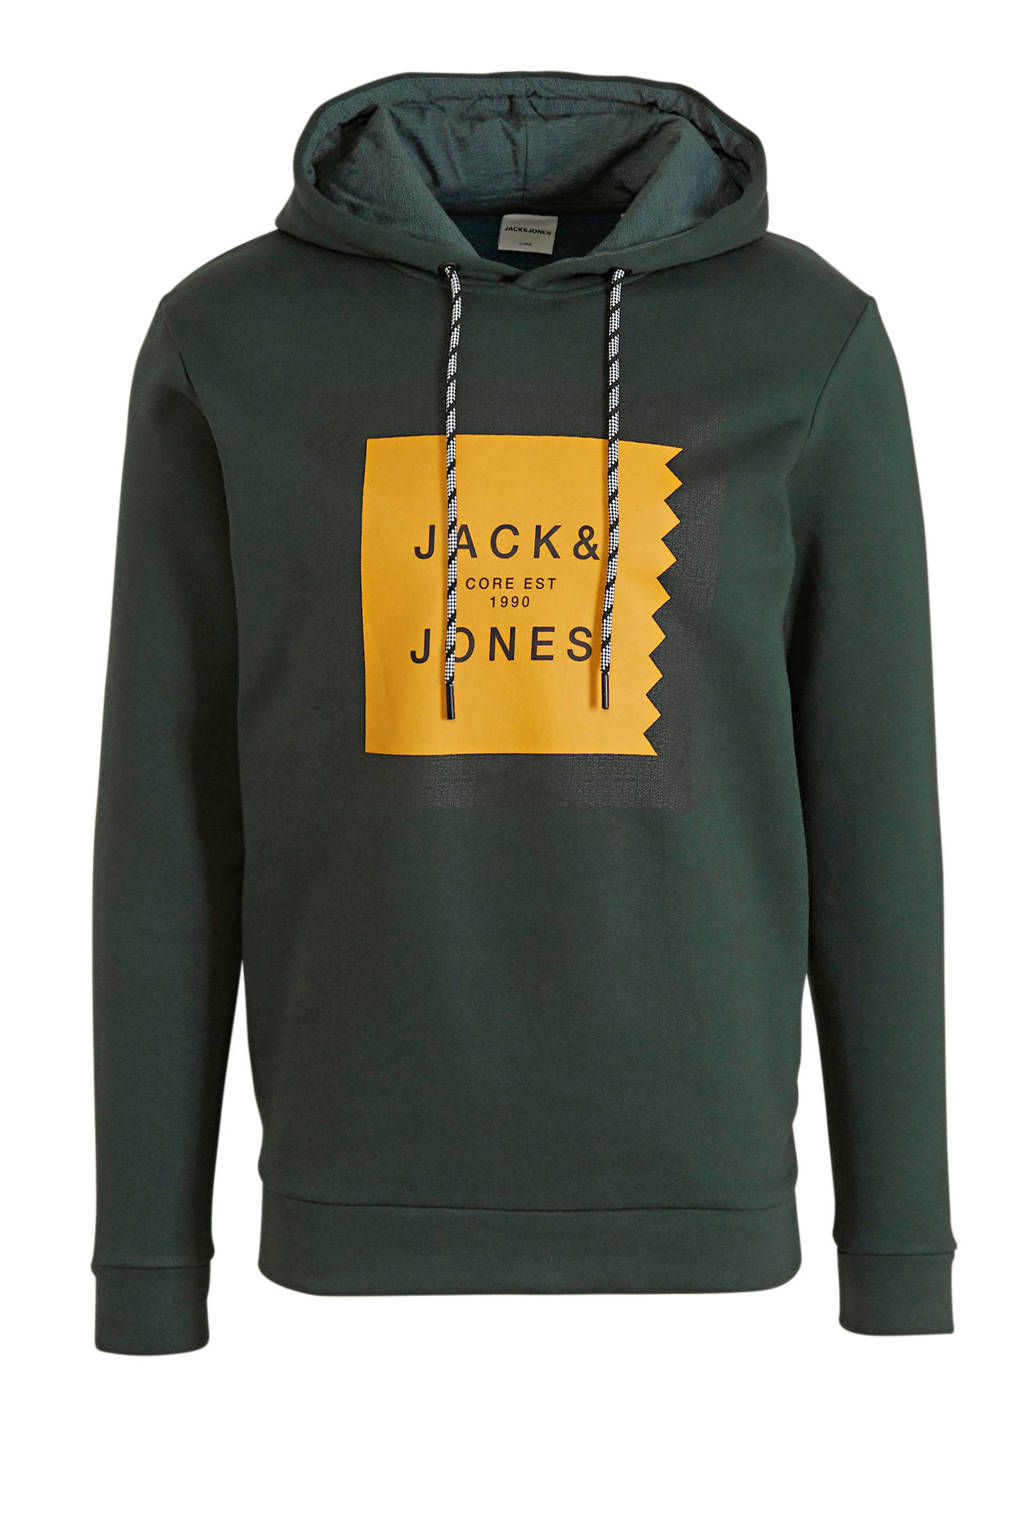 JACK & JONES CORE hoodie met printopdruk donkergroen, Donkergroen